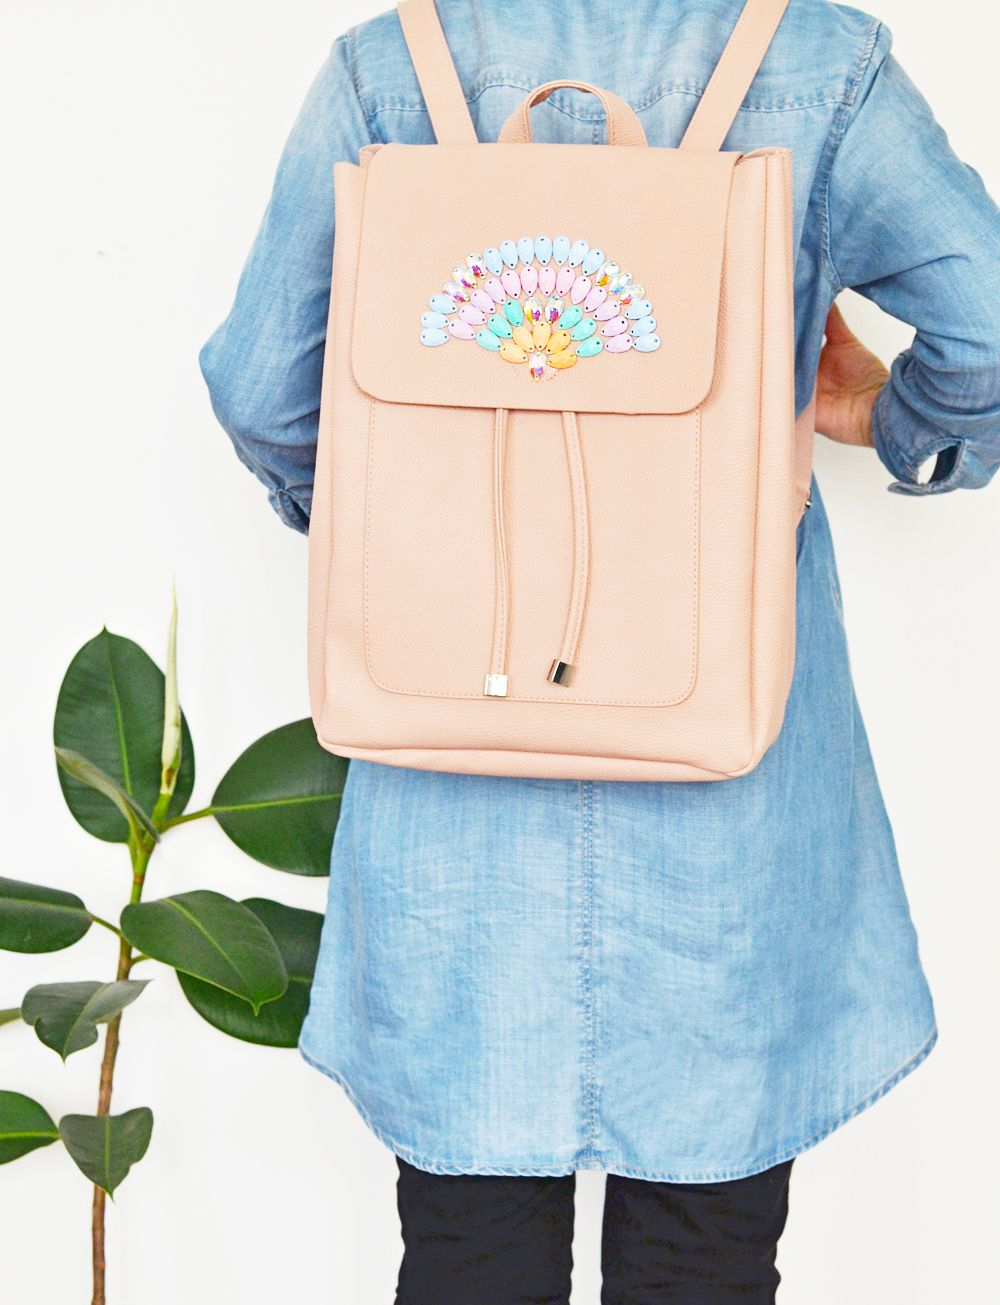 Diy colorful crystal backpack2 DIY Backpacks Ideas For Your Kids' Back-To-School Season